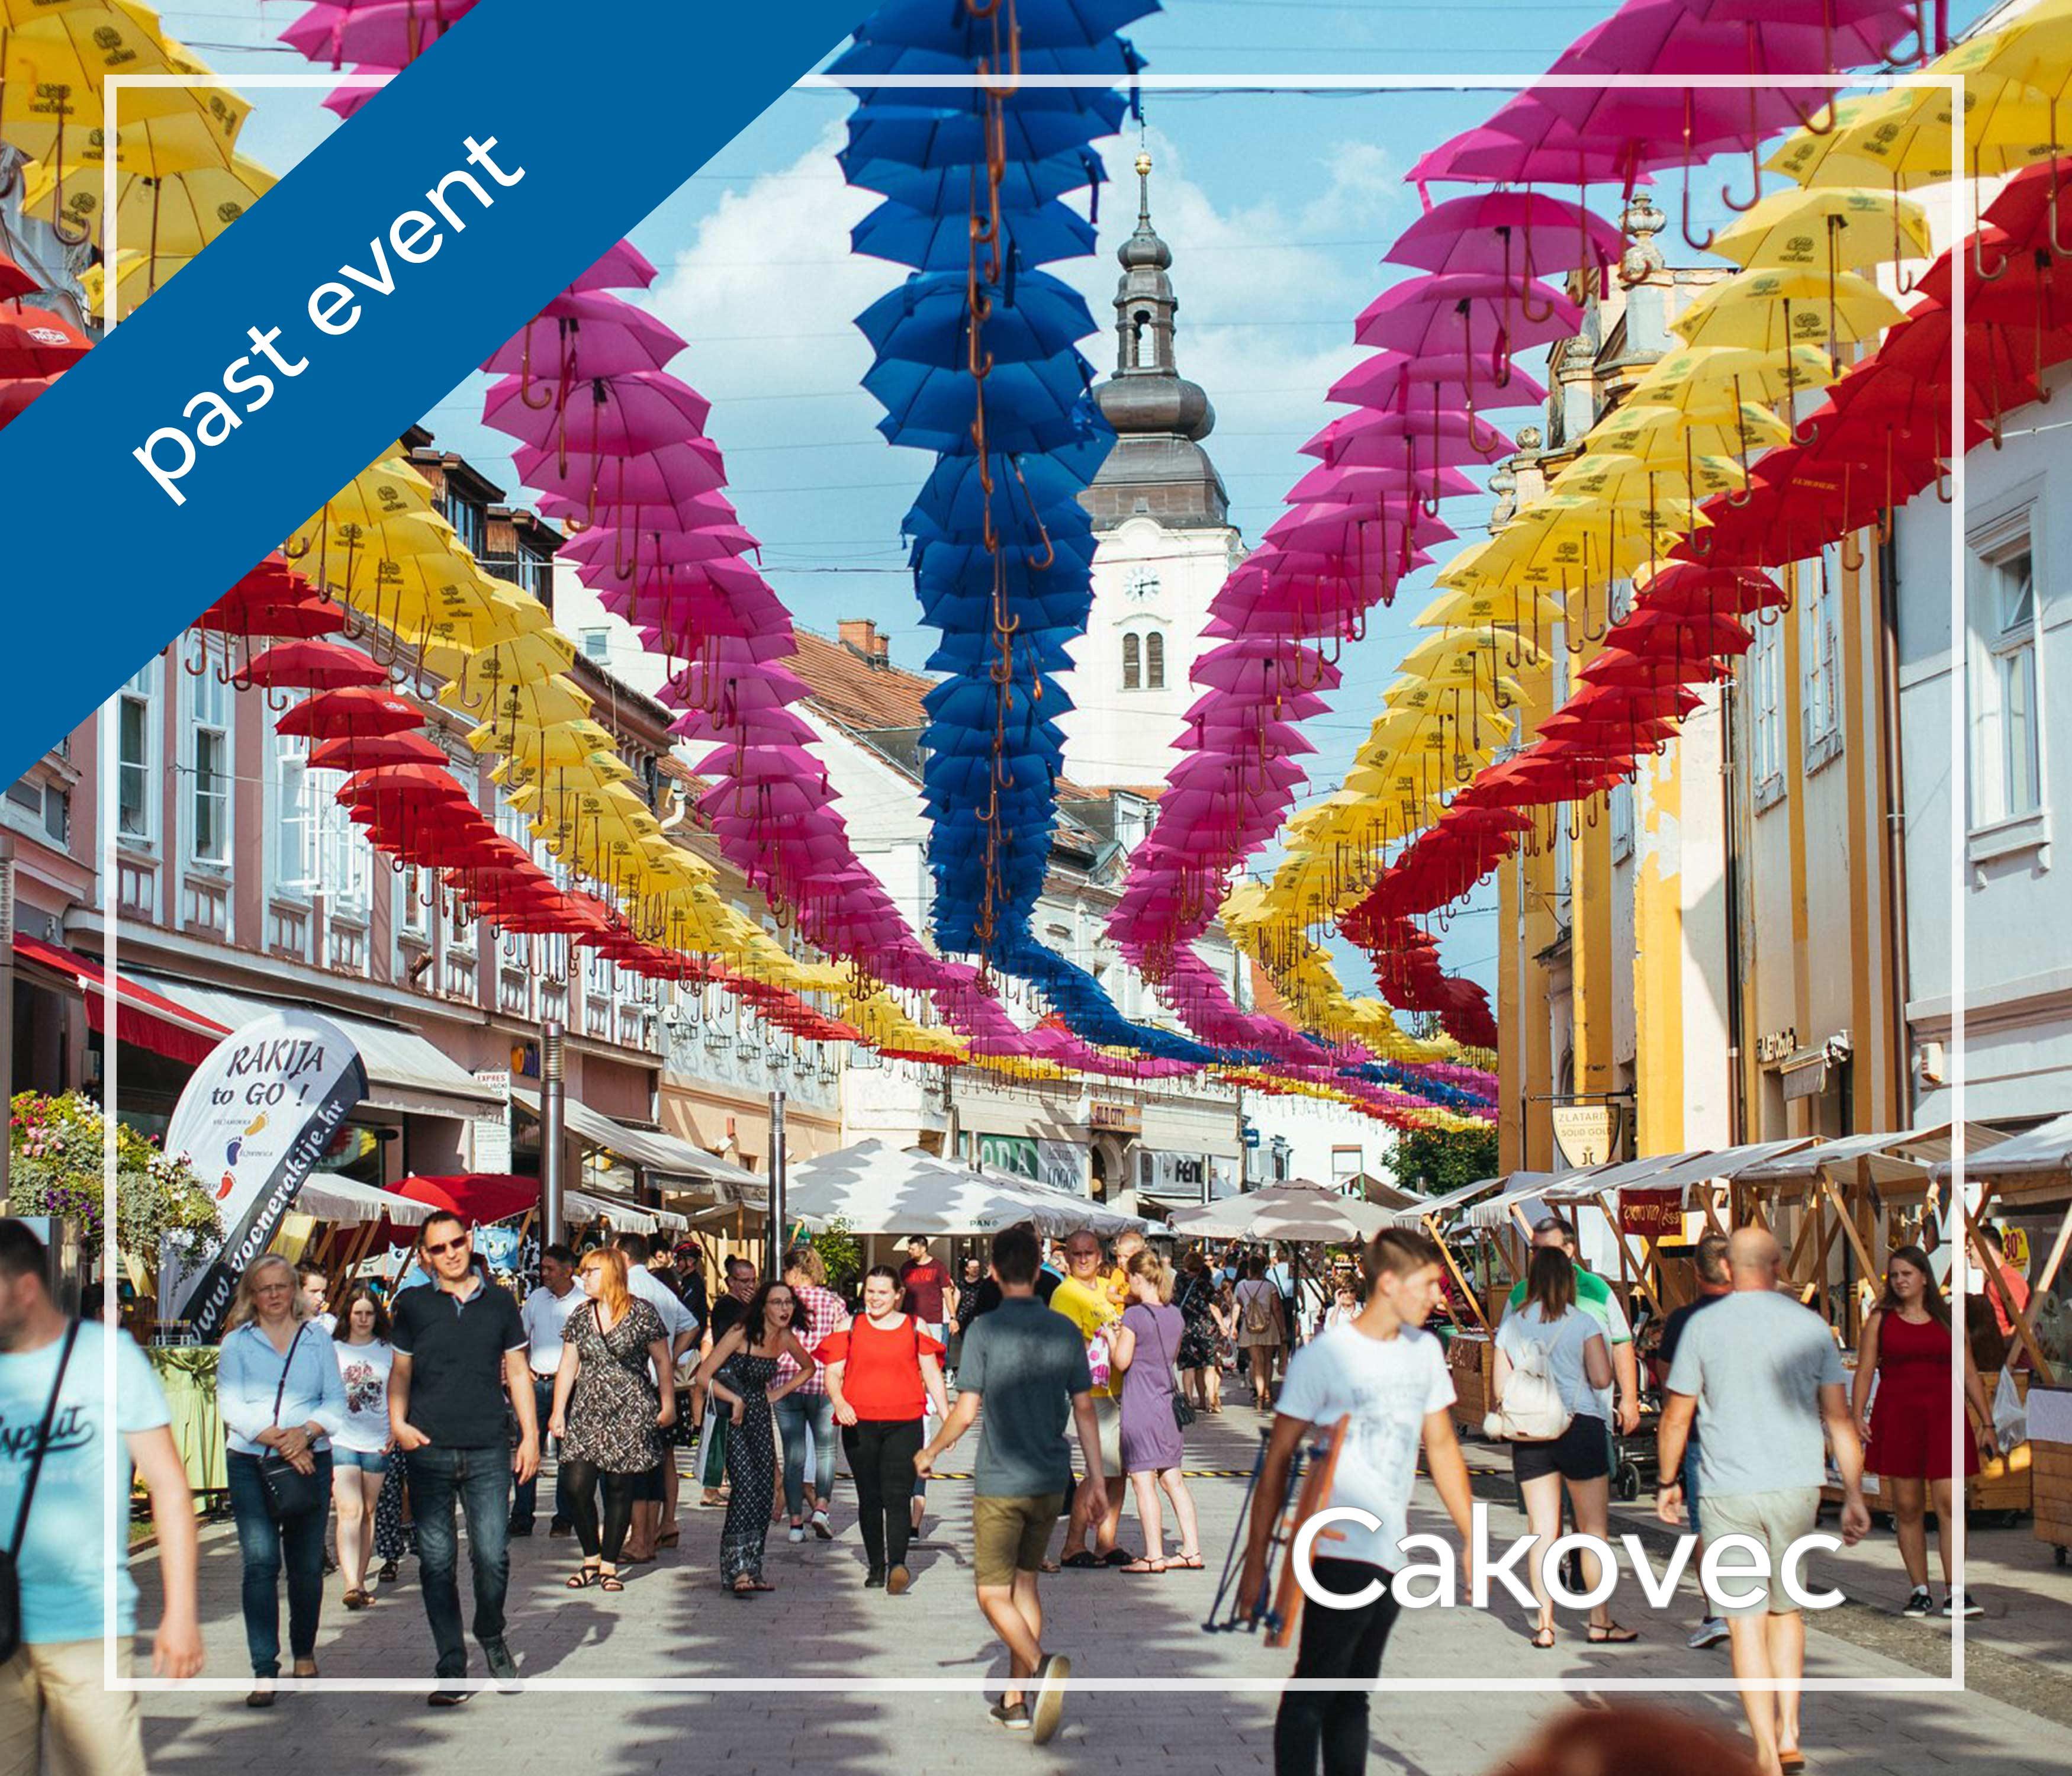 Past-event—Cakovec